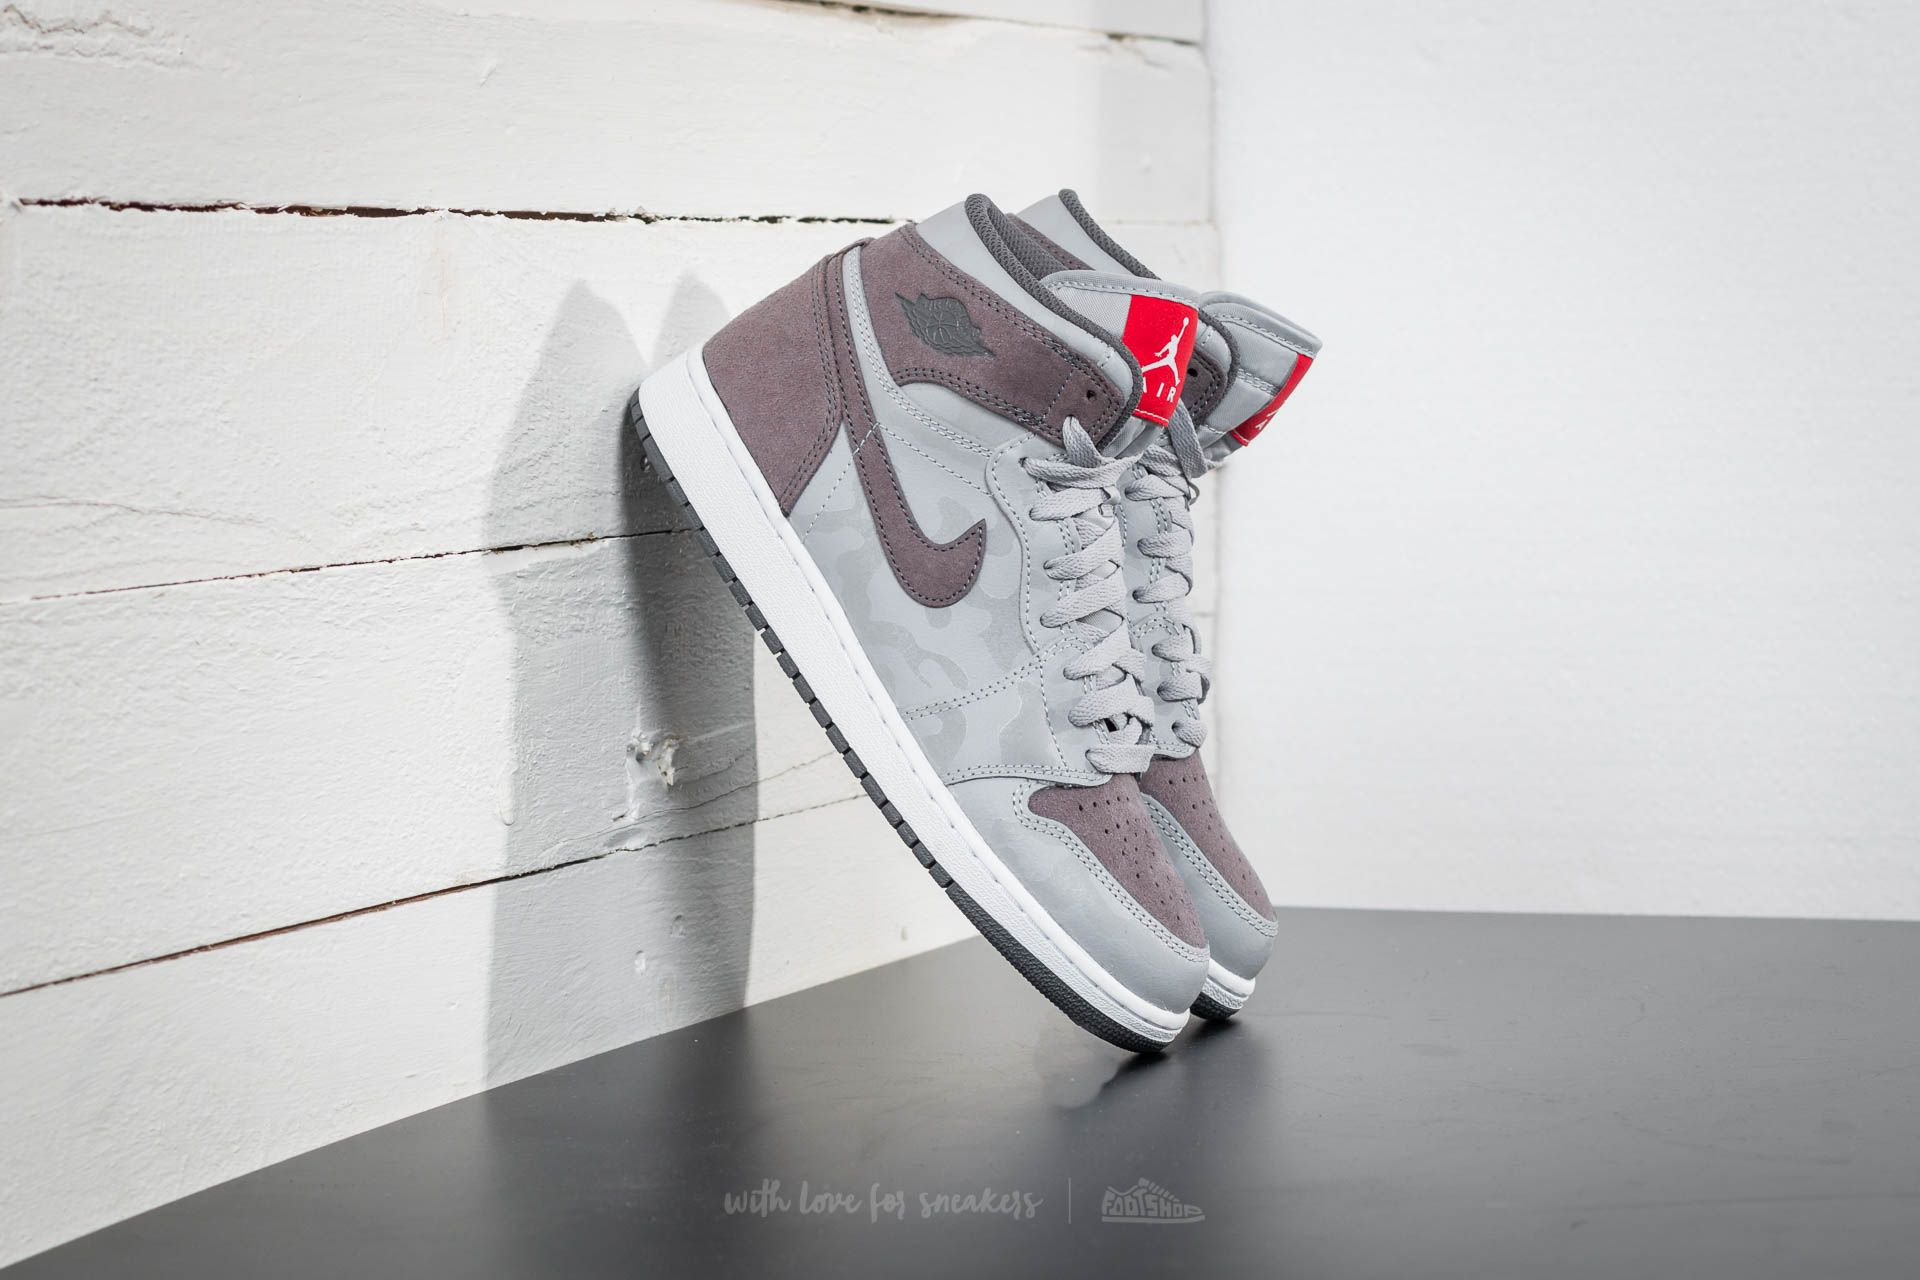 895a3098dbec2 Air Jordan 1 Retro Hi Premium BG Wolf Grey  Dark Grey-White ...